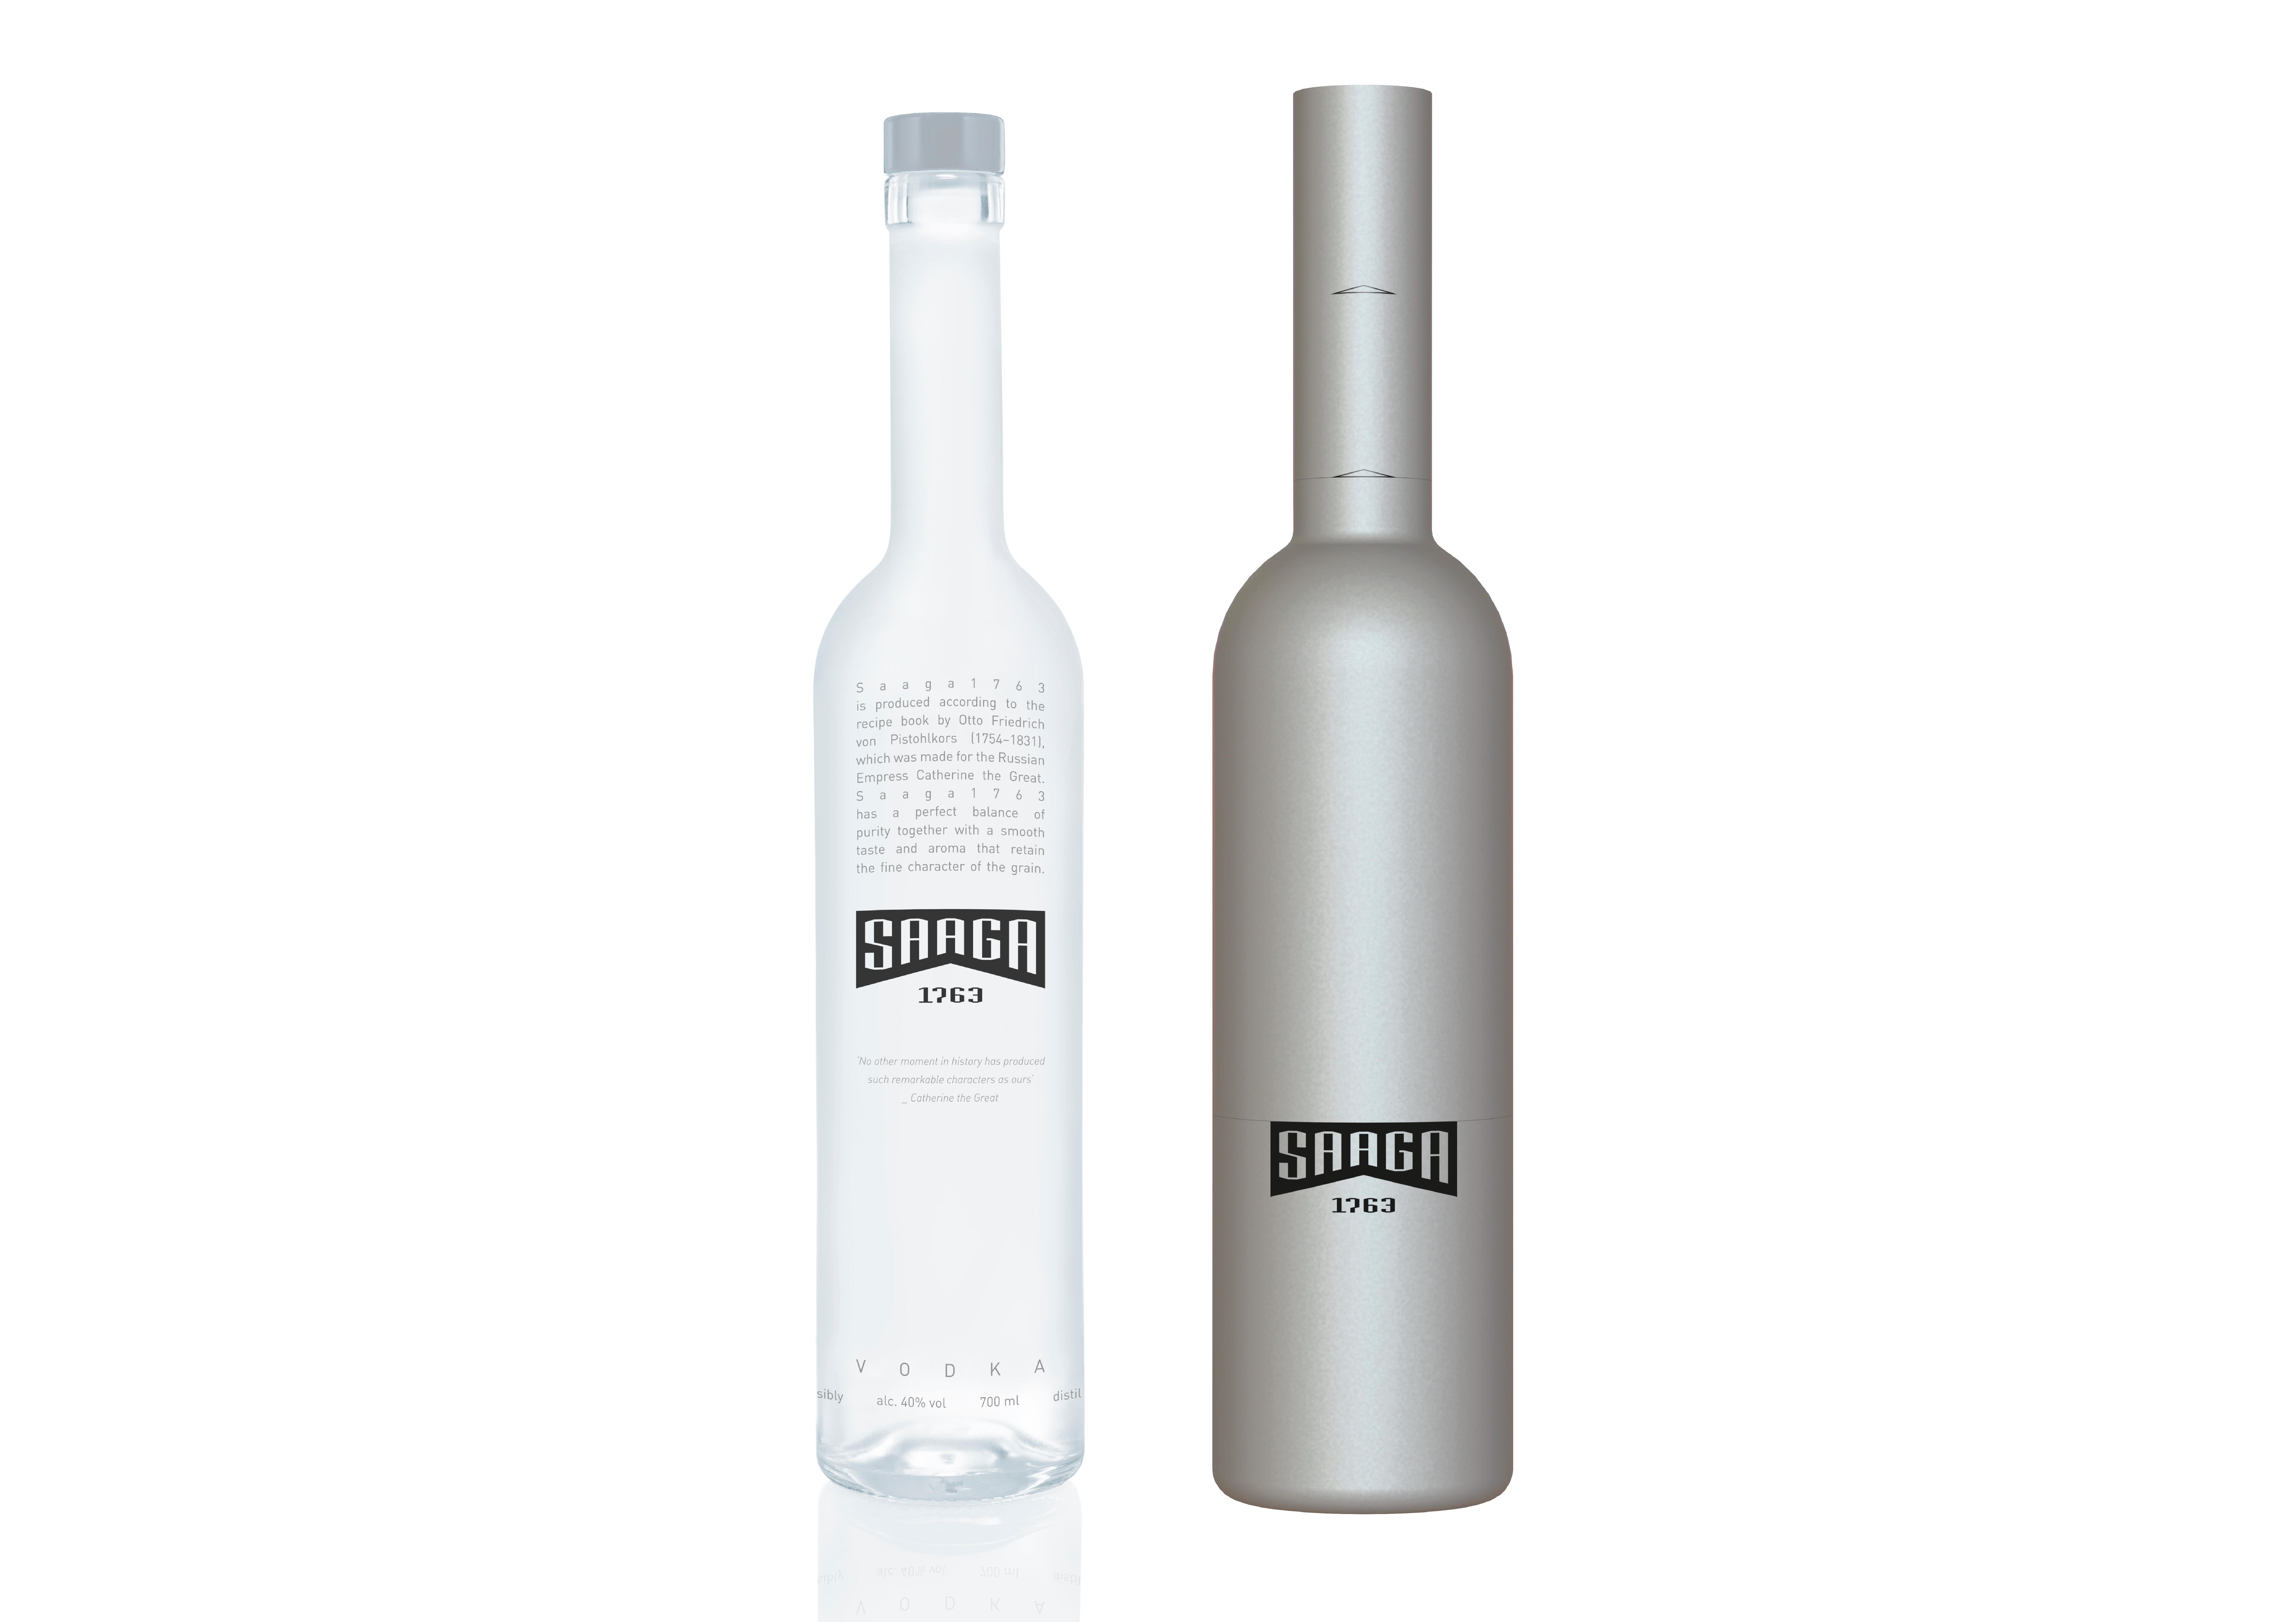 Saaga Vodka package design design studio minumo triin maripuu